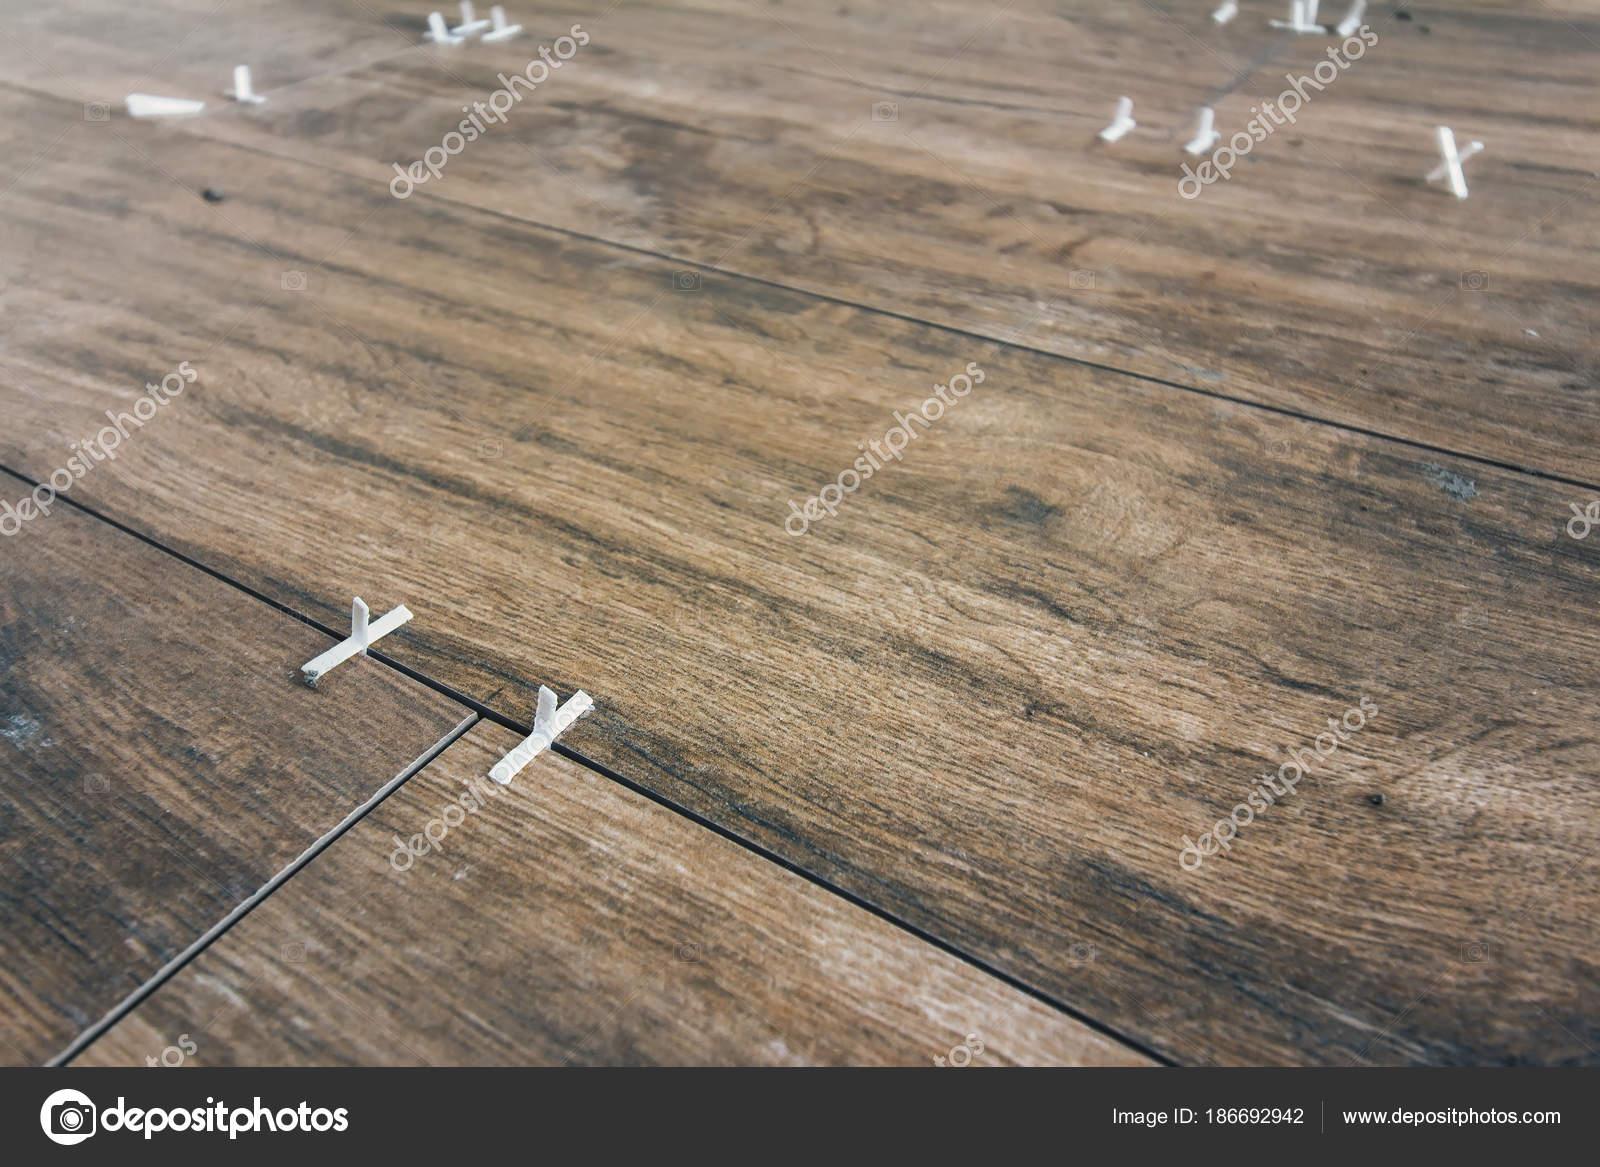 Processo posa piastrelle pavimento u2014 foto stock © findeep #186692942